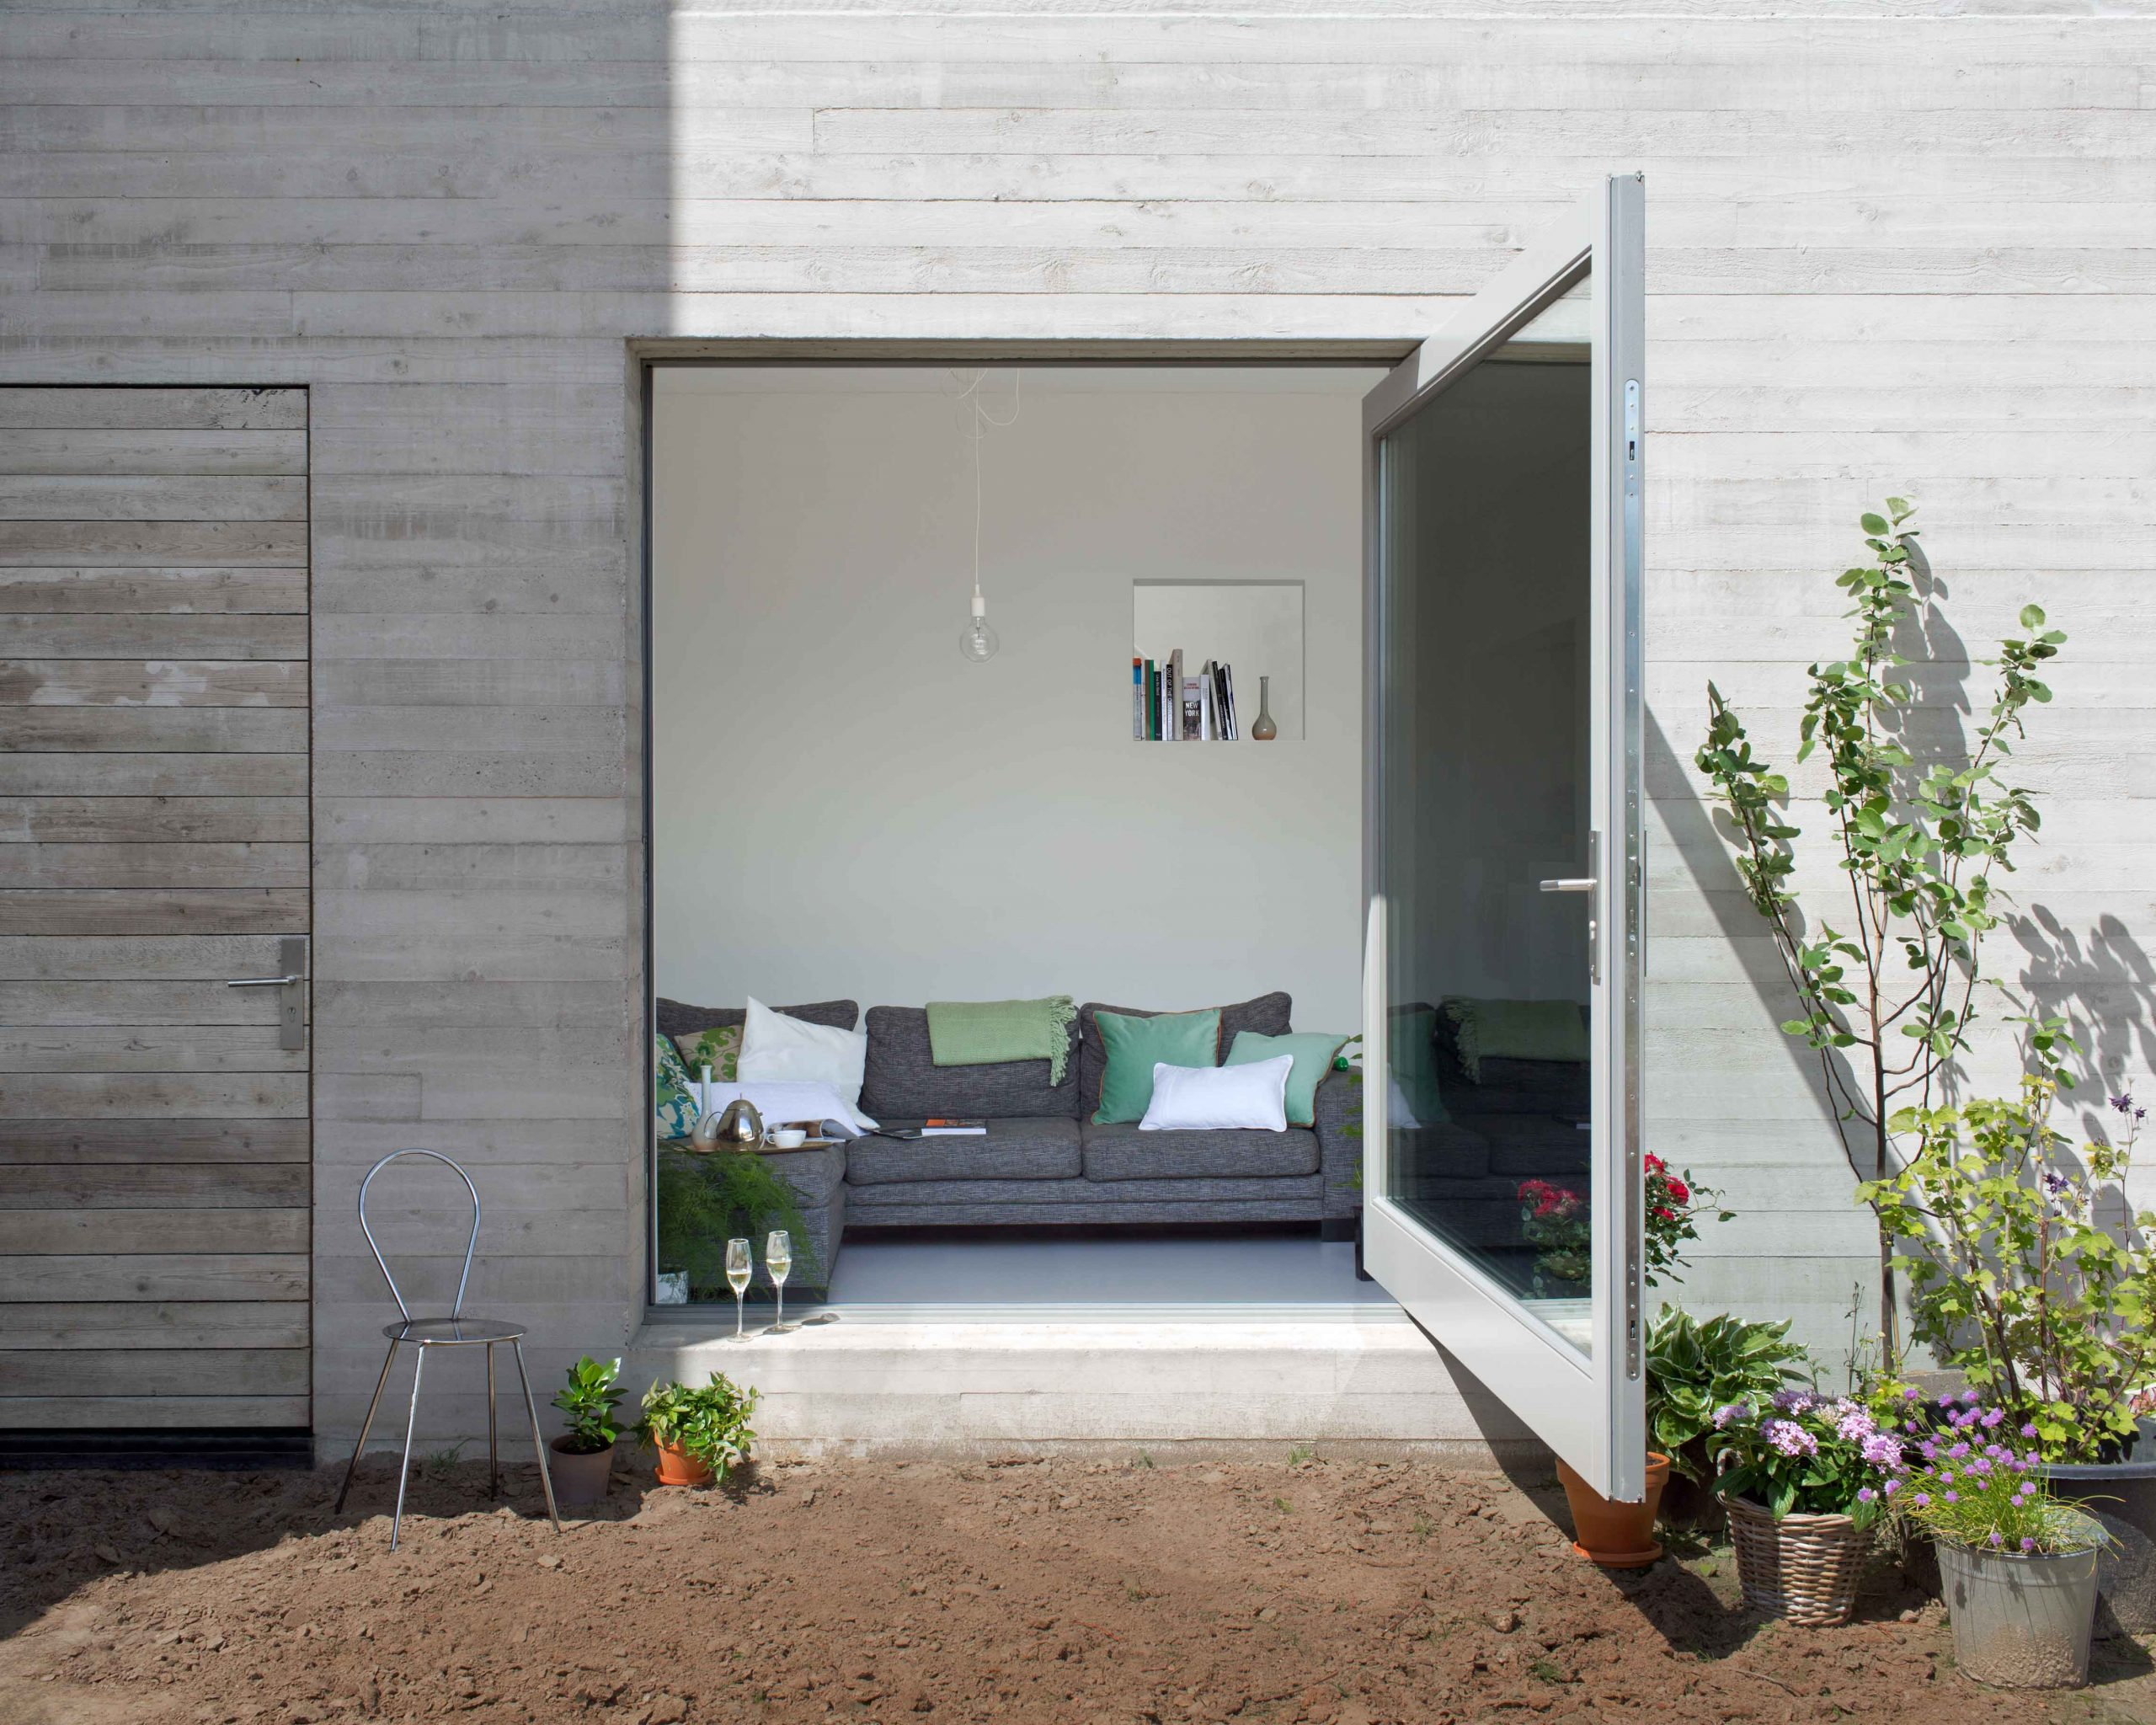 grande-porte-pivotante-en-verre-vers-le-jardin-avec-cadre-en-acier-blanc-fritsjurgens-scaled.jpg